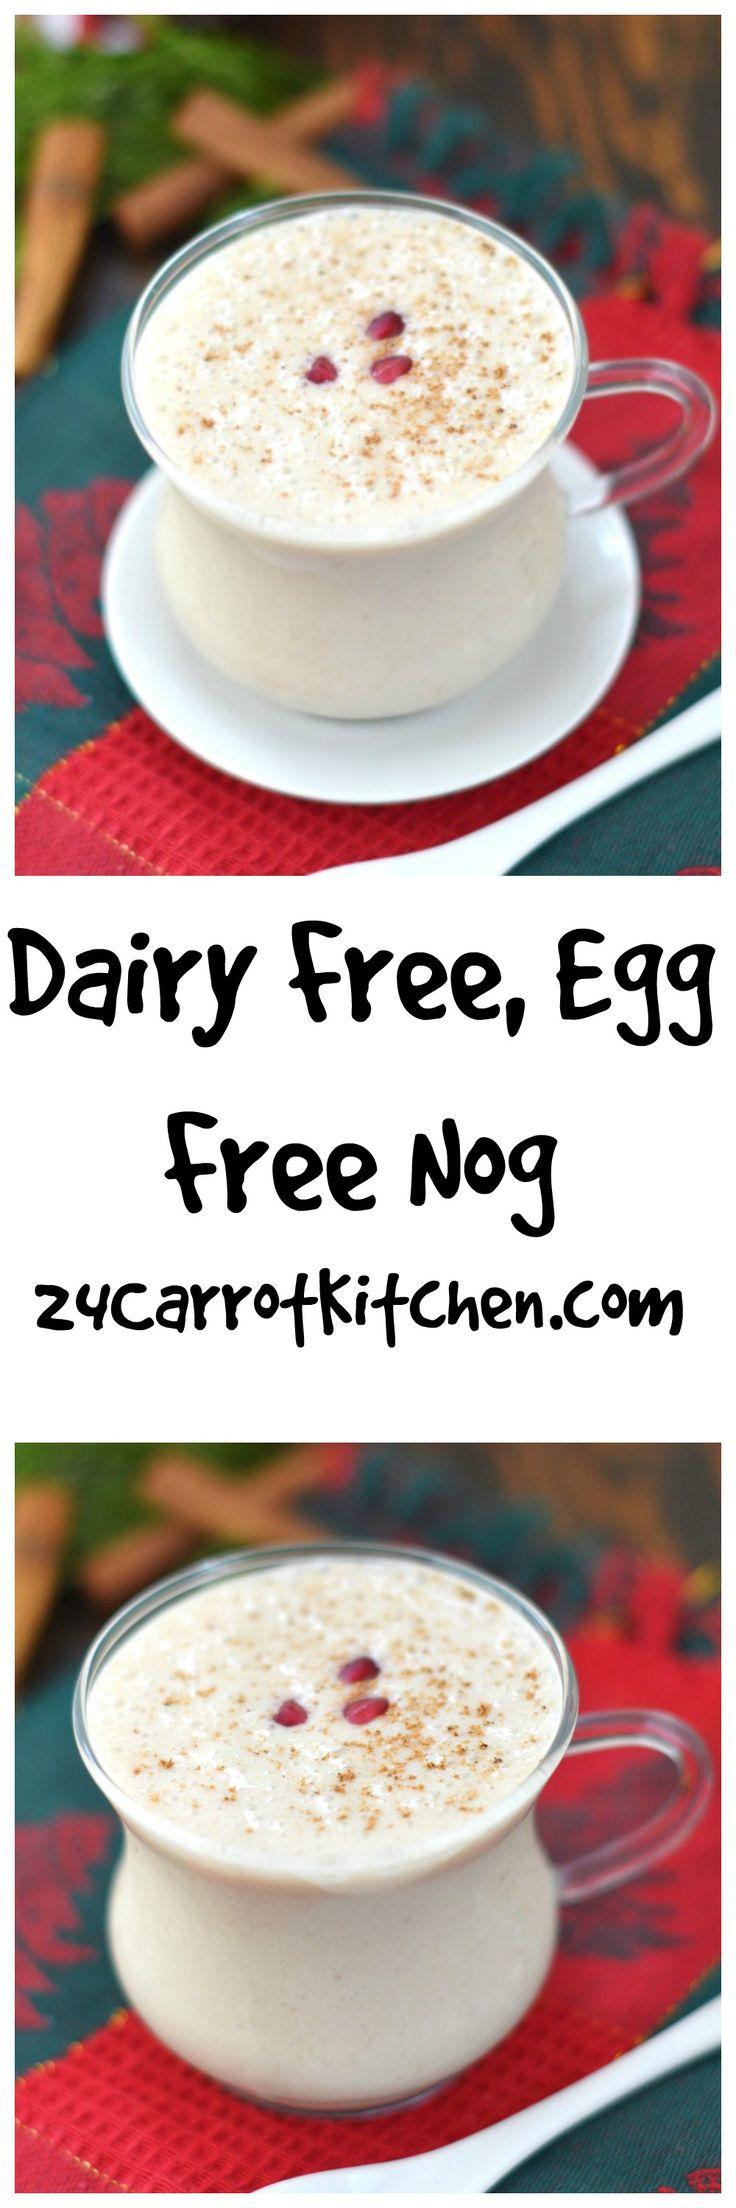 Dairy Free, Egg Free Nog - Super easy! Whip up in your blender in a minute! #vegan #paleo #paleofriendly #glutenfree #grainfree #eggnog #holiday